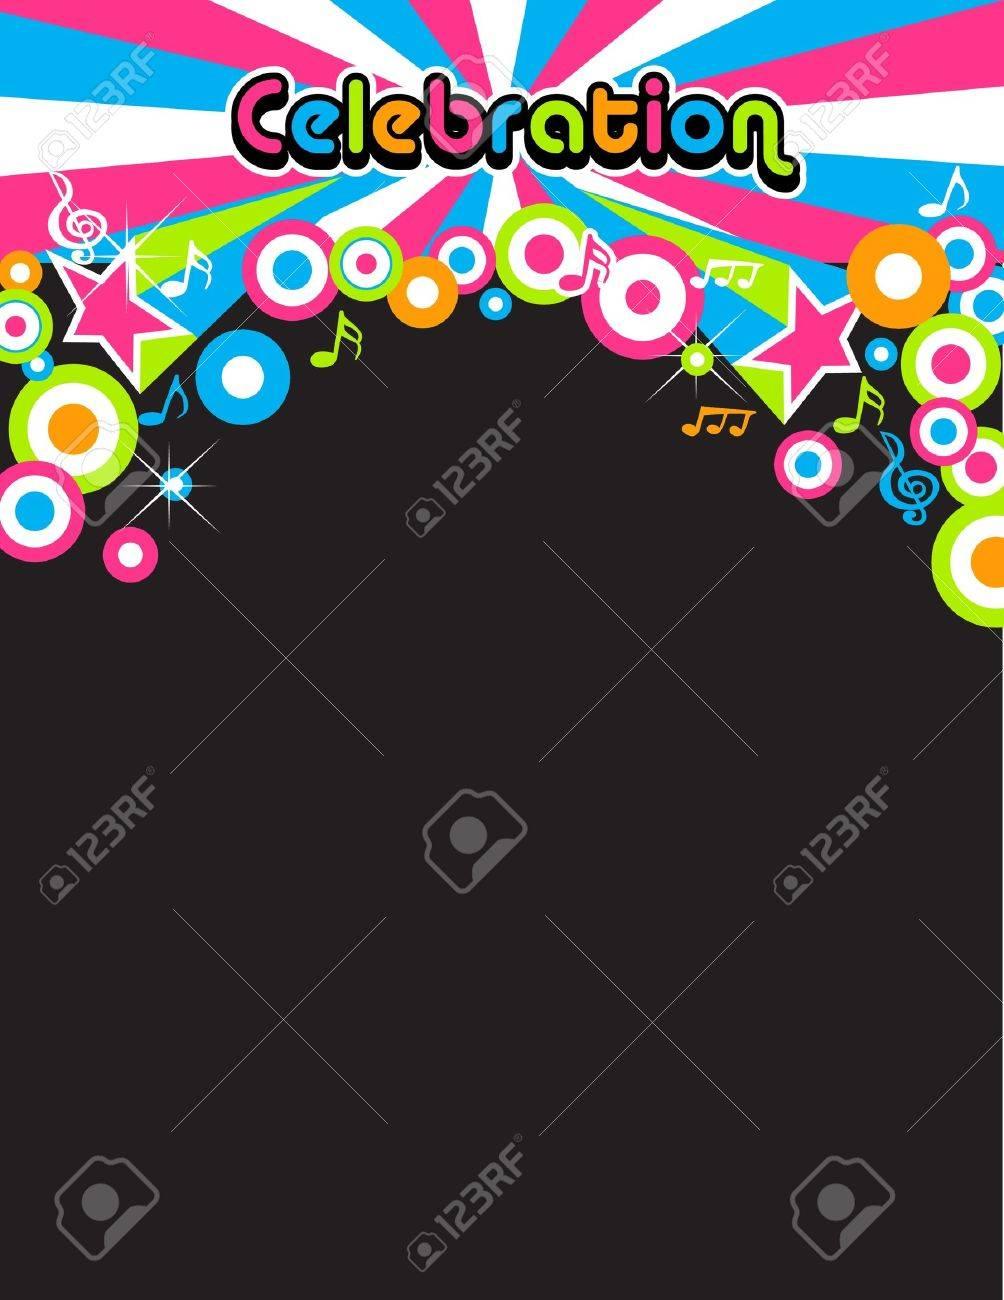 Celebration Party background Stock Vector - 11181494